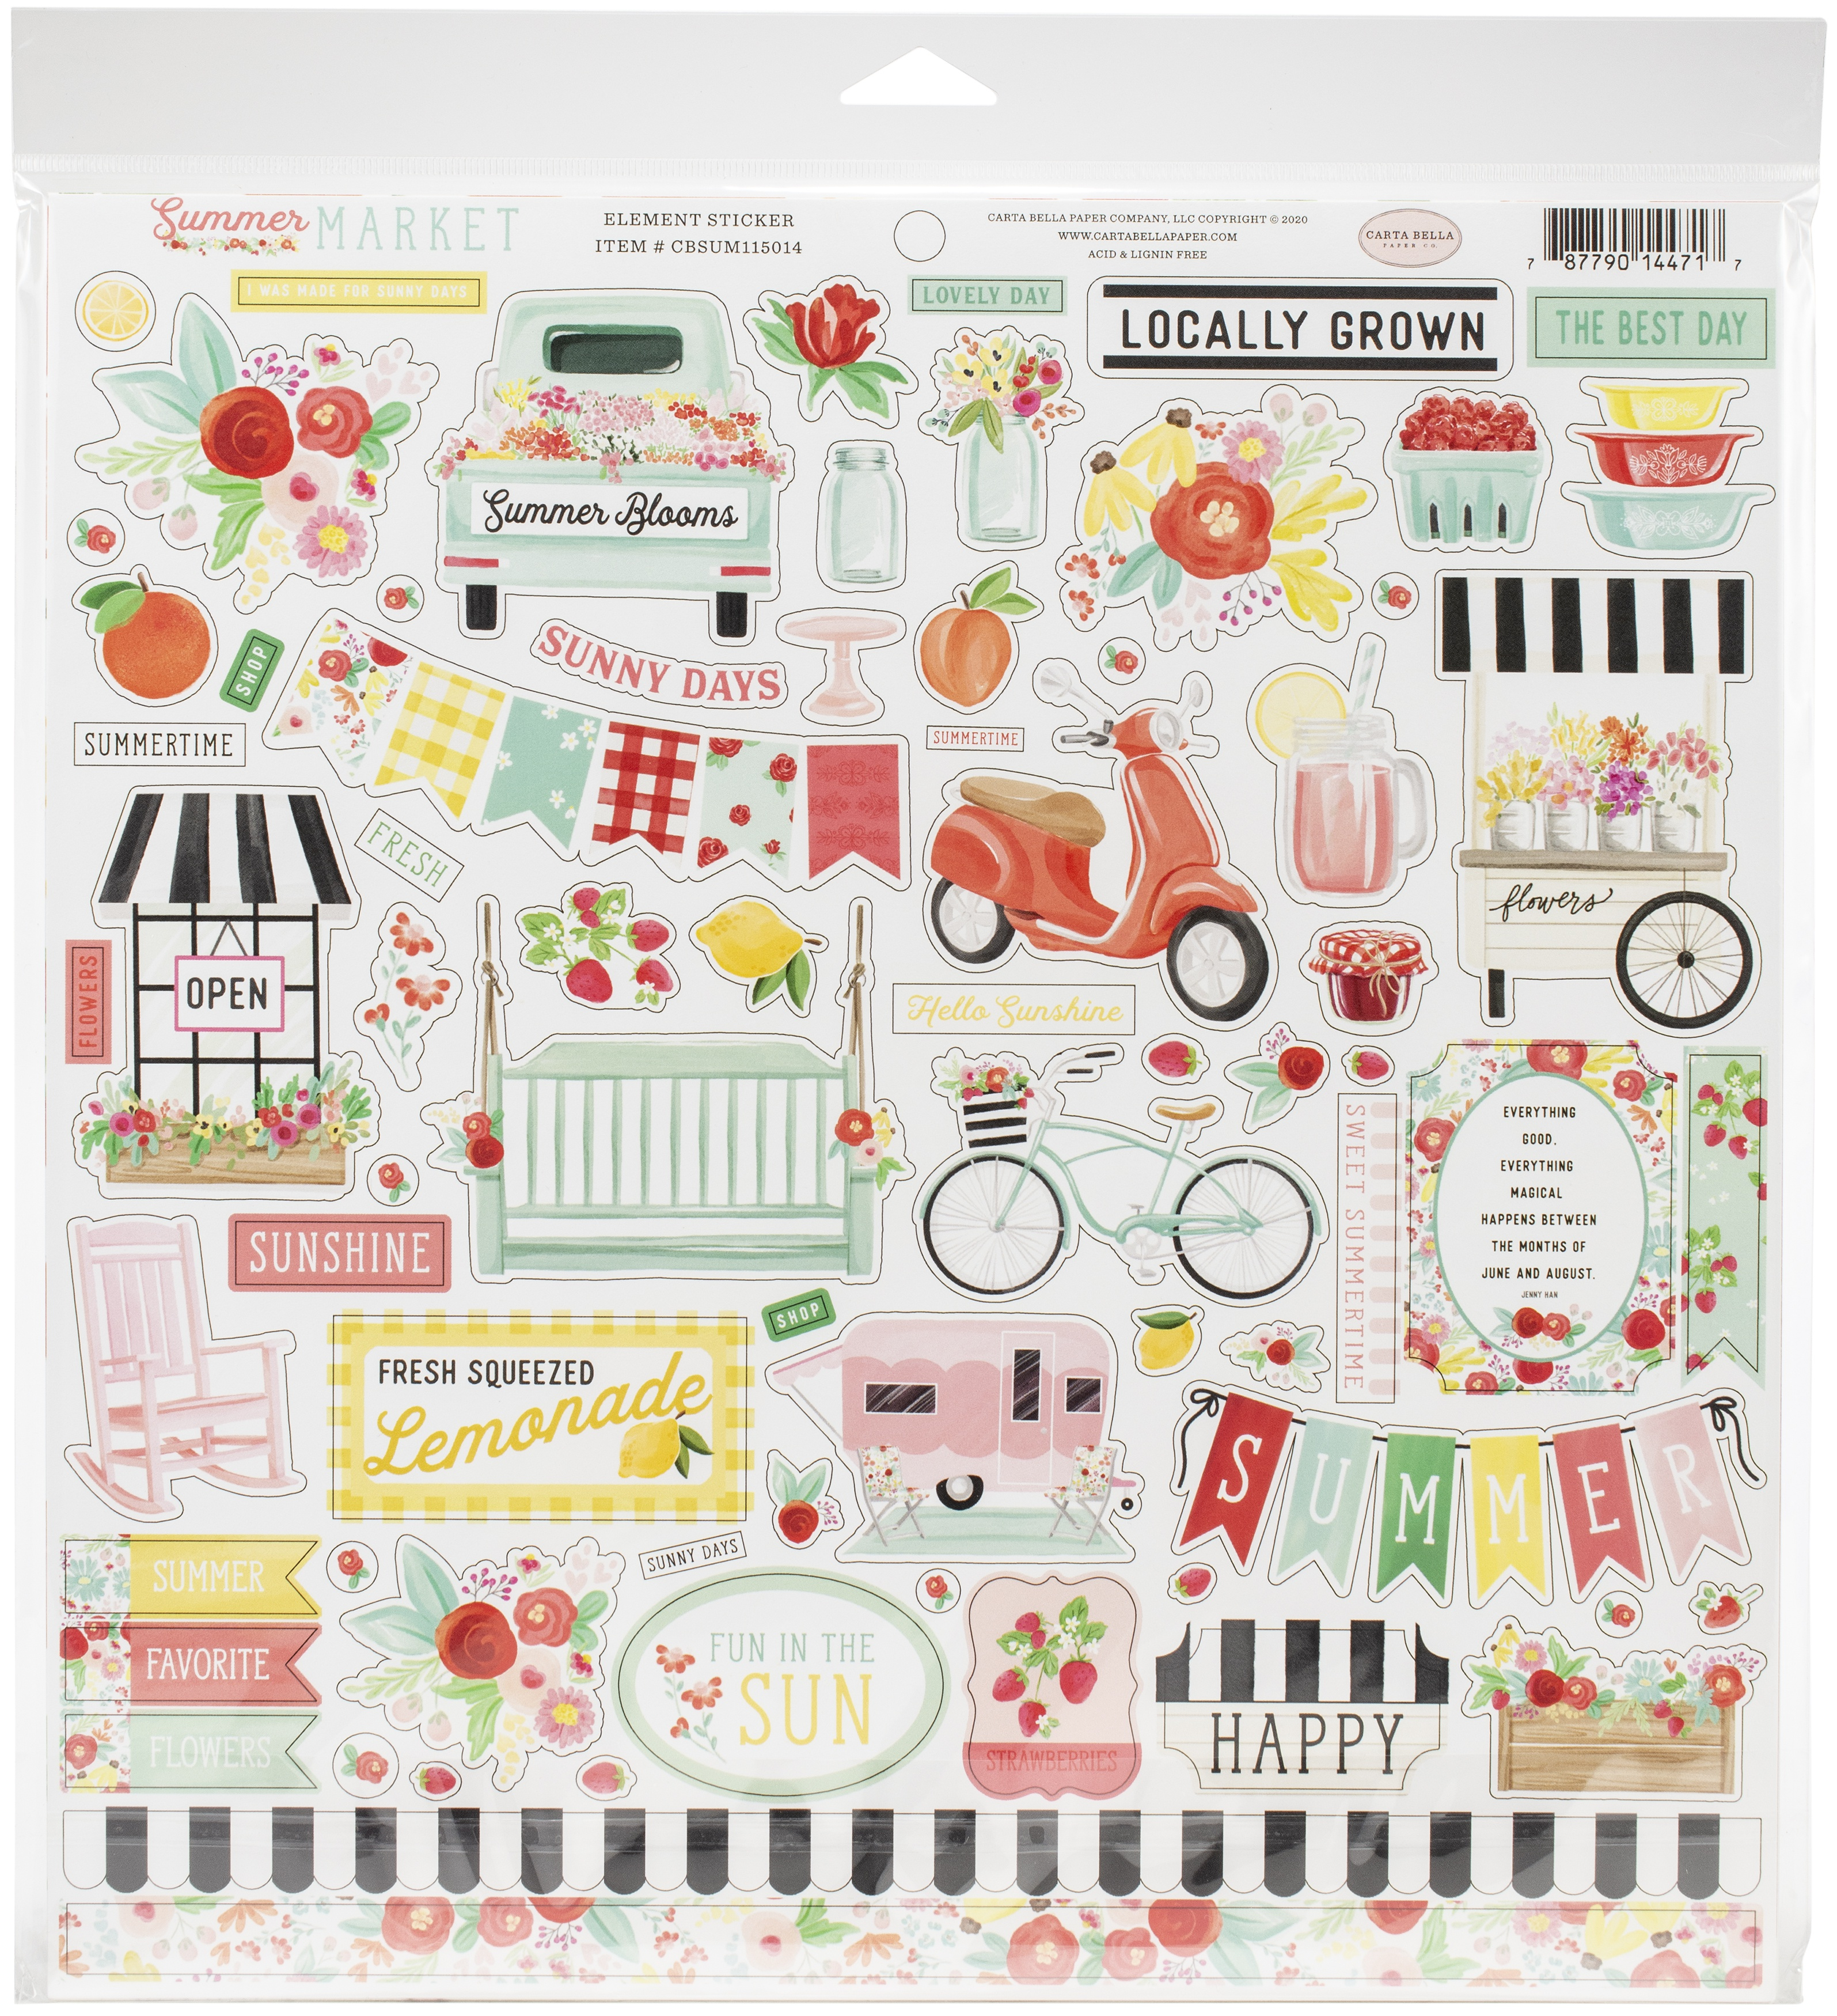 Summer Market 12x12 Collection Kit